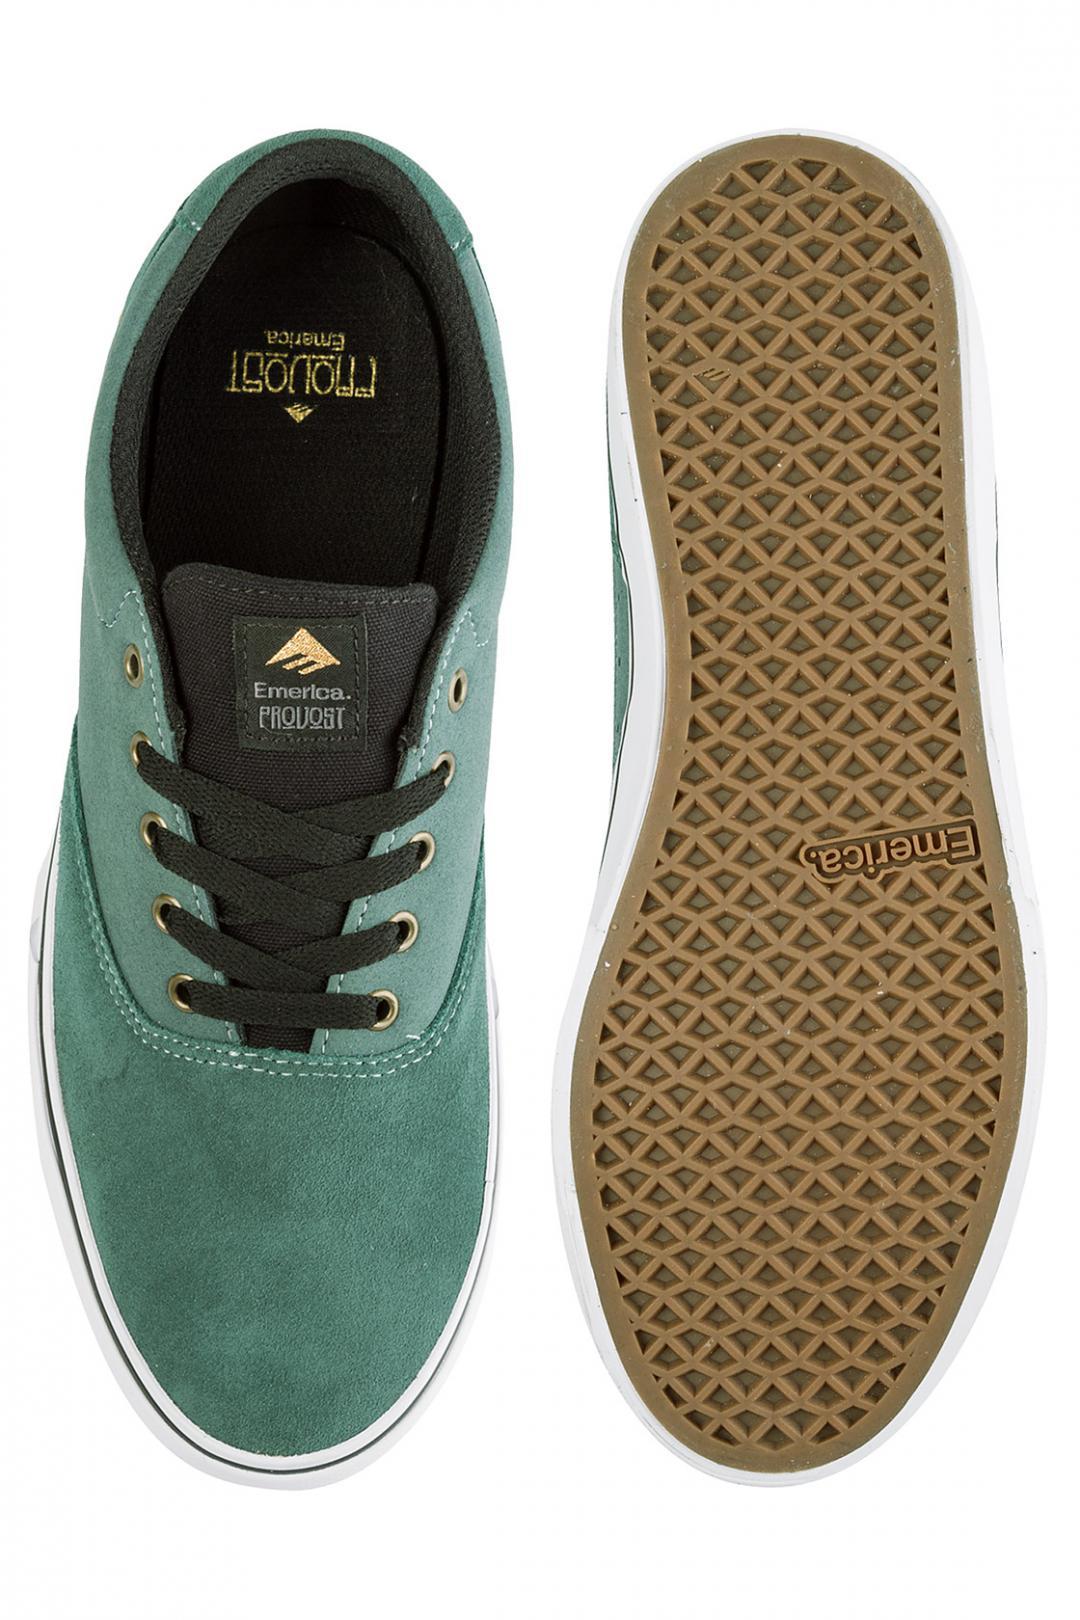 Uomo Emerica Provost Slim Vulc turquoise | Scarpe da skate